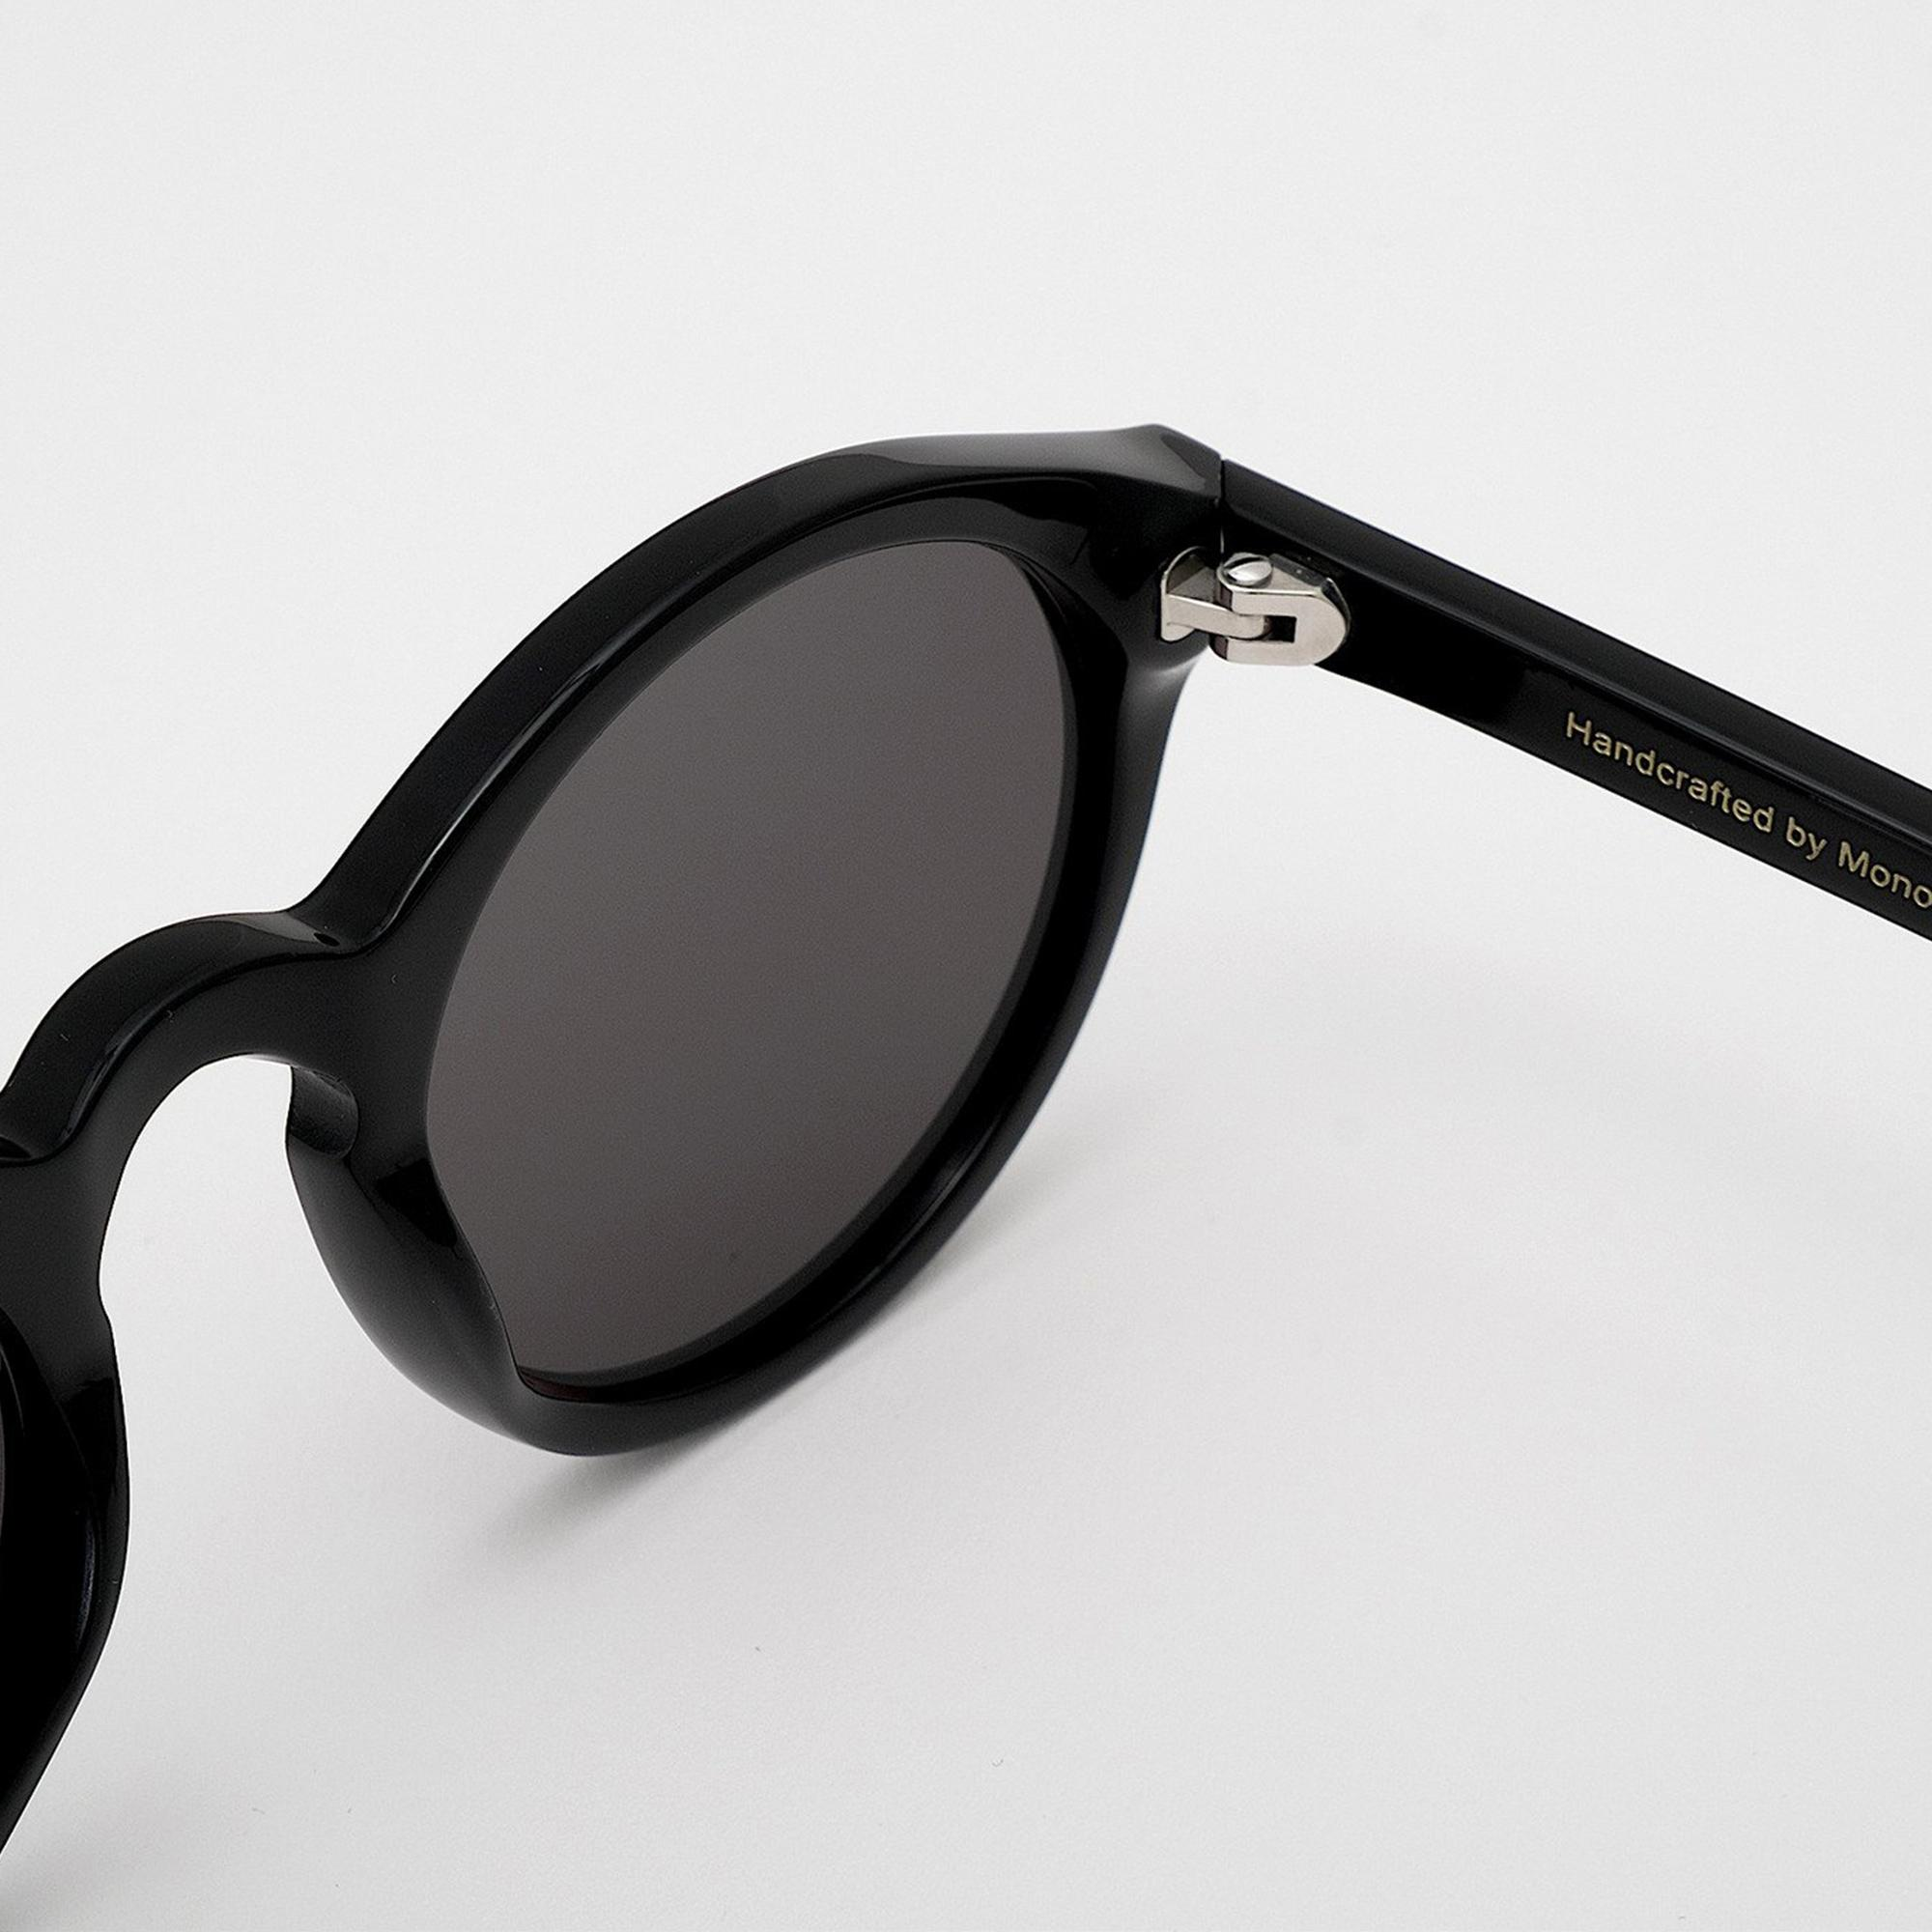 4e2de7275e Monokel Eyewear - Black Barstow Sunglasses for Men - Lyst. View fullscreen